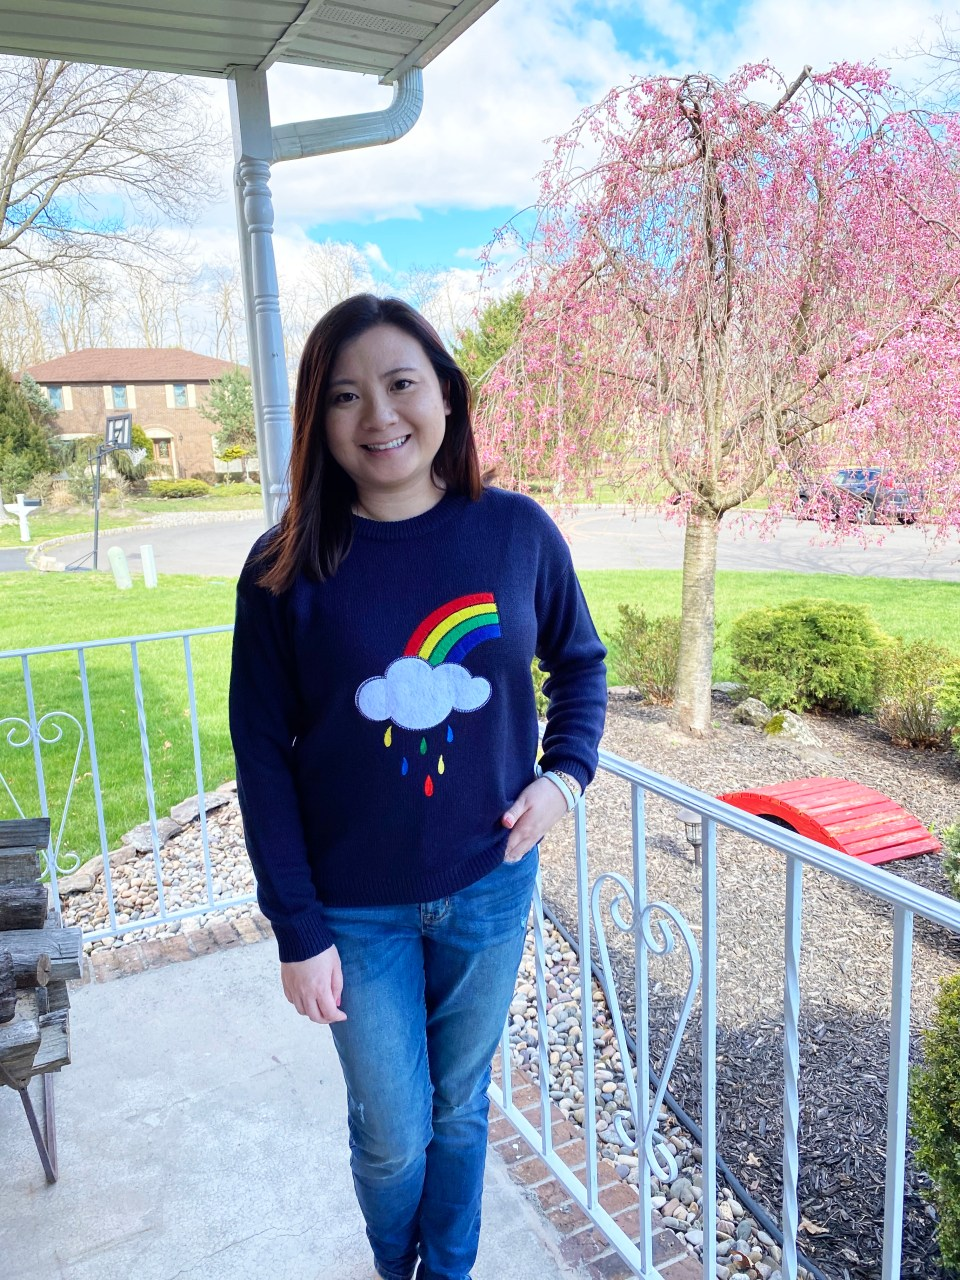 Rainbow & Cloud Sweater 3